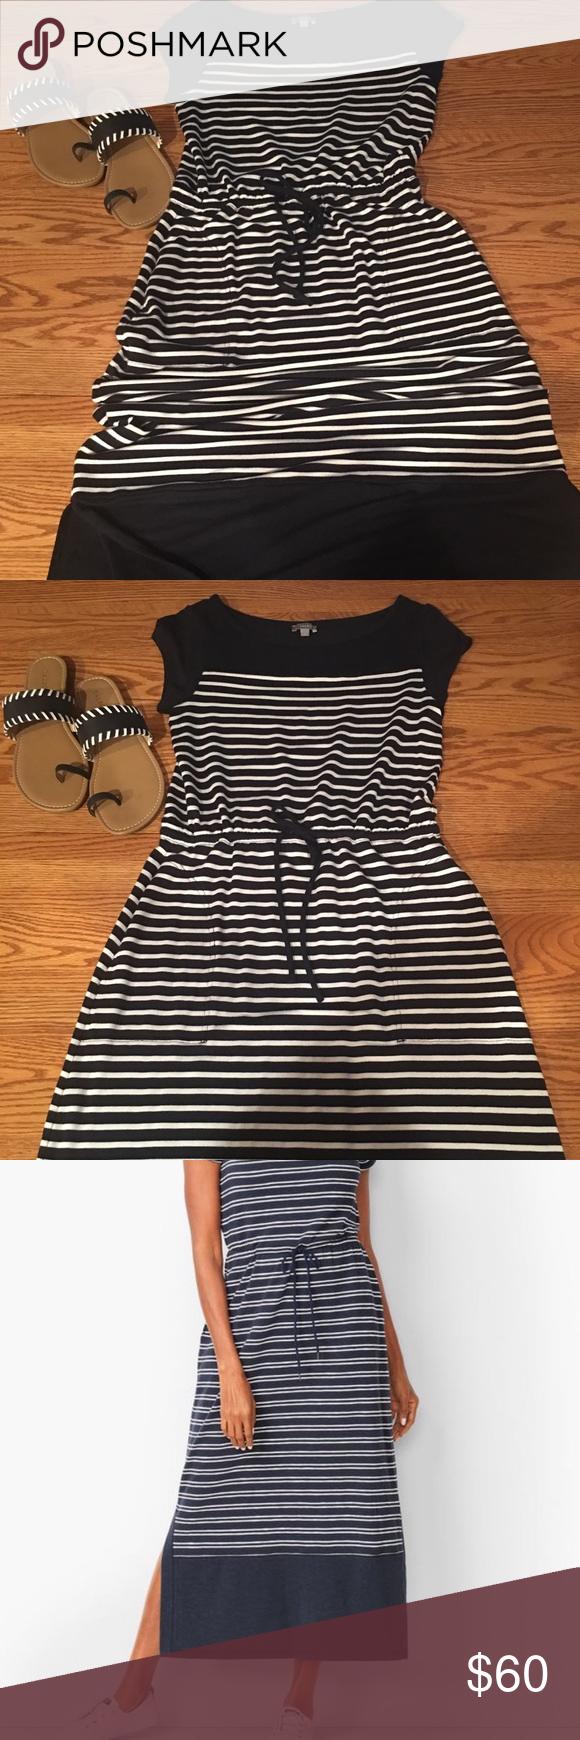 Final Sale T Talbots Stripe Nautical Maxi Dress Clothes Design Dresses Talbots [ 1740 x 580 Pixel ]